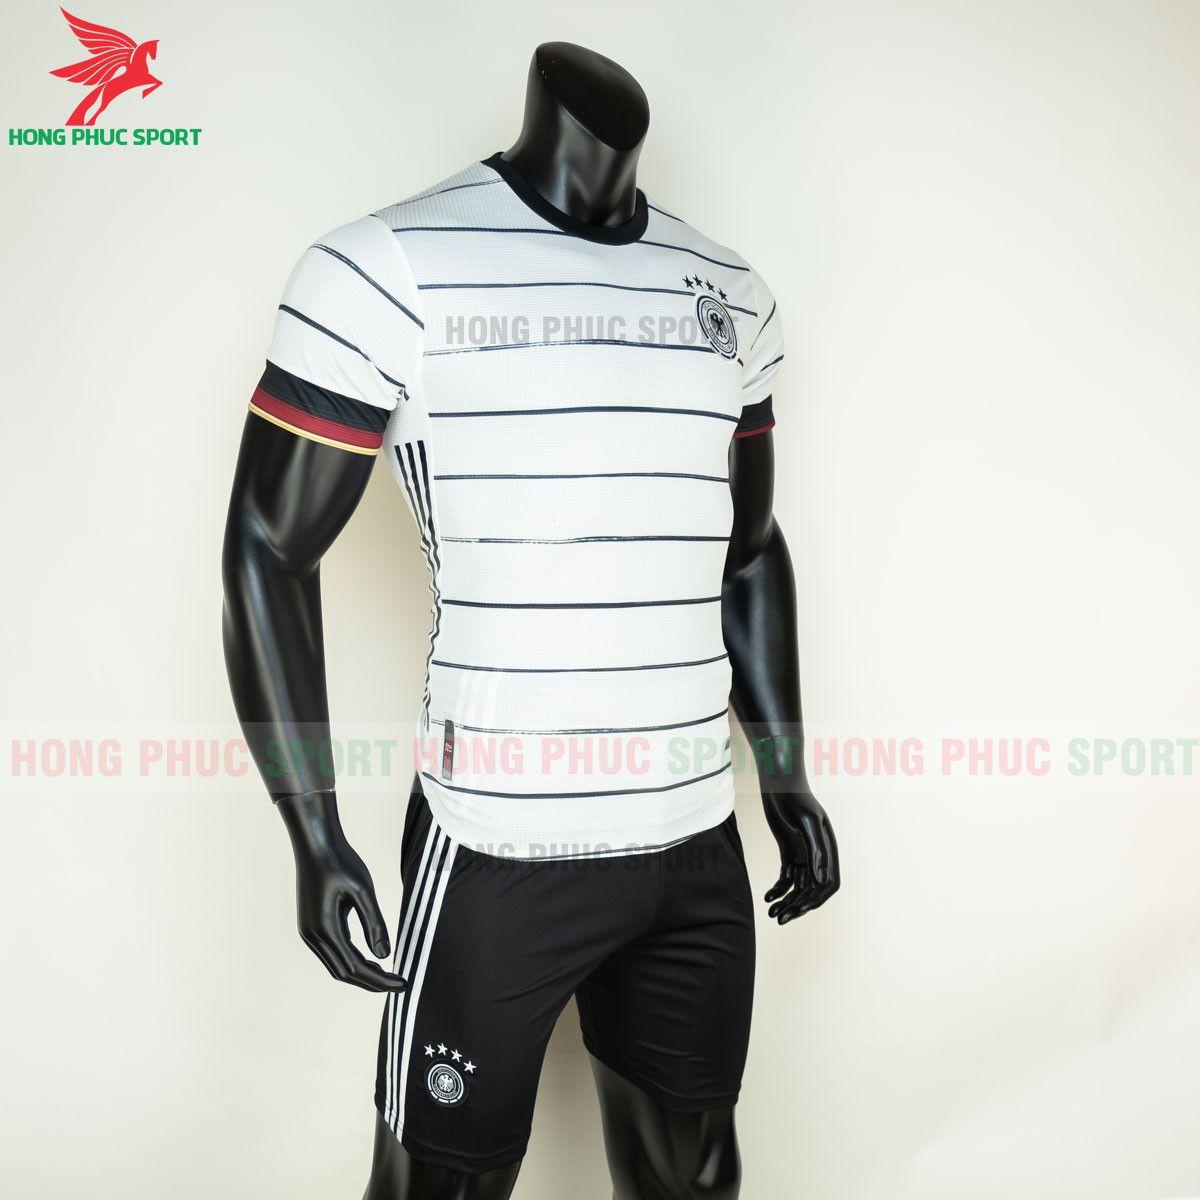 https://cdn.hongphucsport.com/unsafe/s4.shopbay.vn/files/285/ao-bong-da-tuyen-duc-2021-san-nha-hang-thai-3-60d300cd92c01.jpg